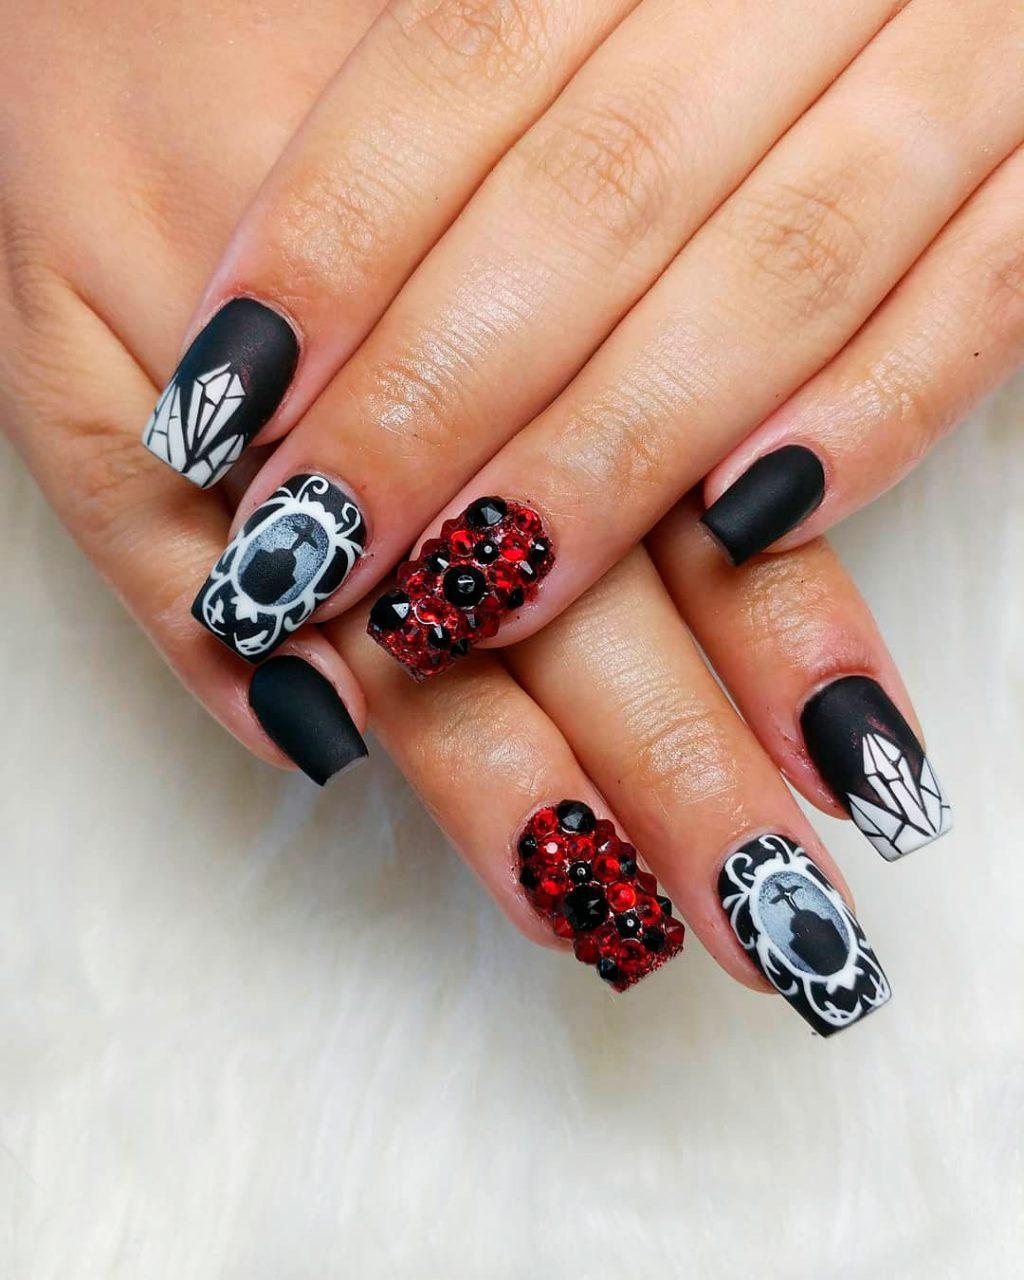 One of the Creepy black Halloween nail ideas!